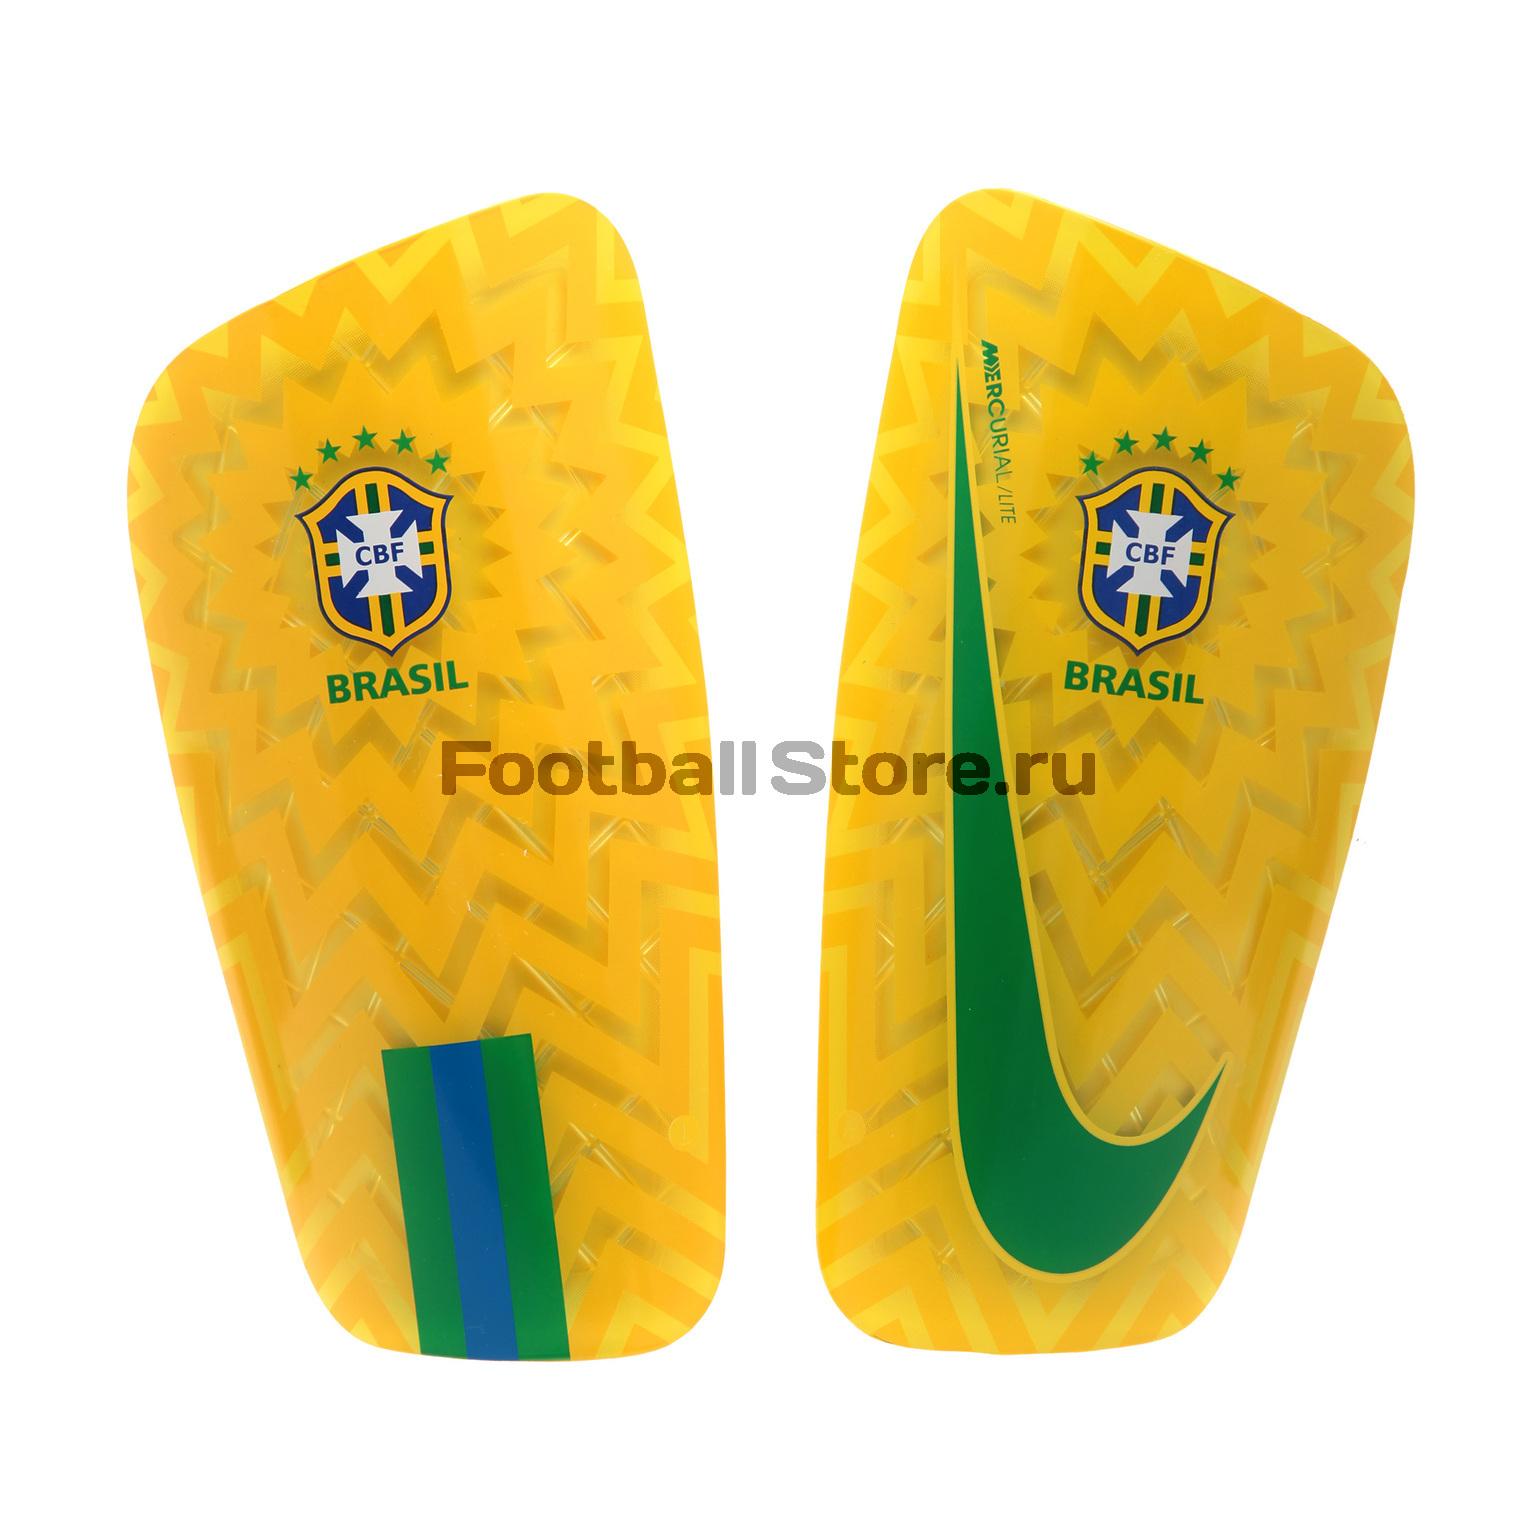 Щитки Nike Mercurial сборной Бразилии SP2123-750 nike nike mercurial lite